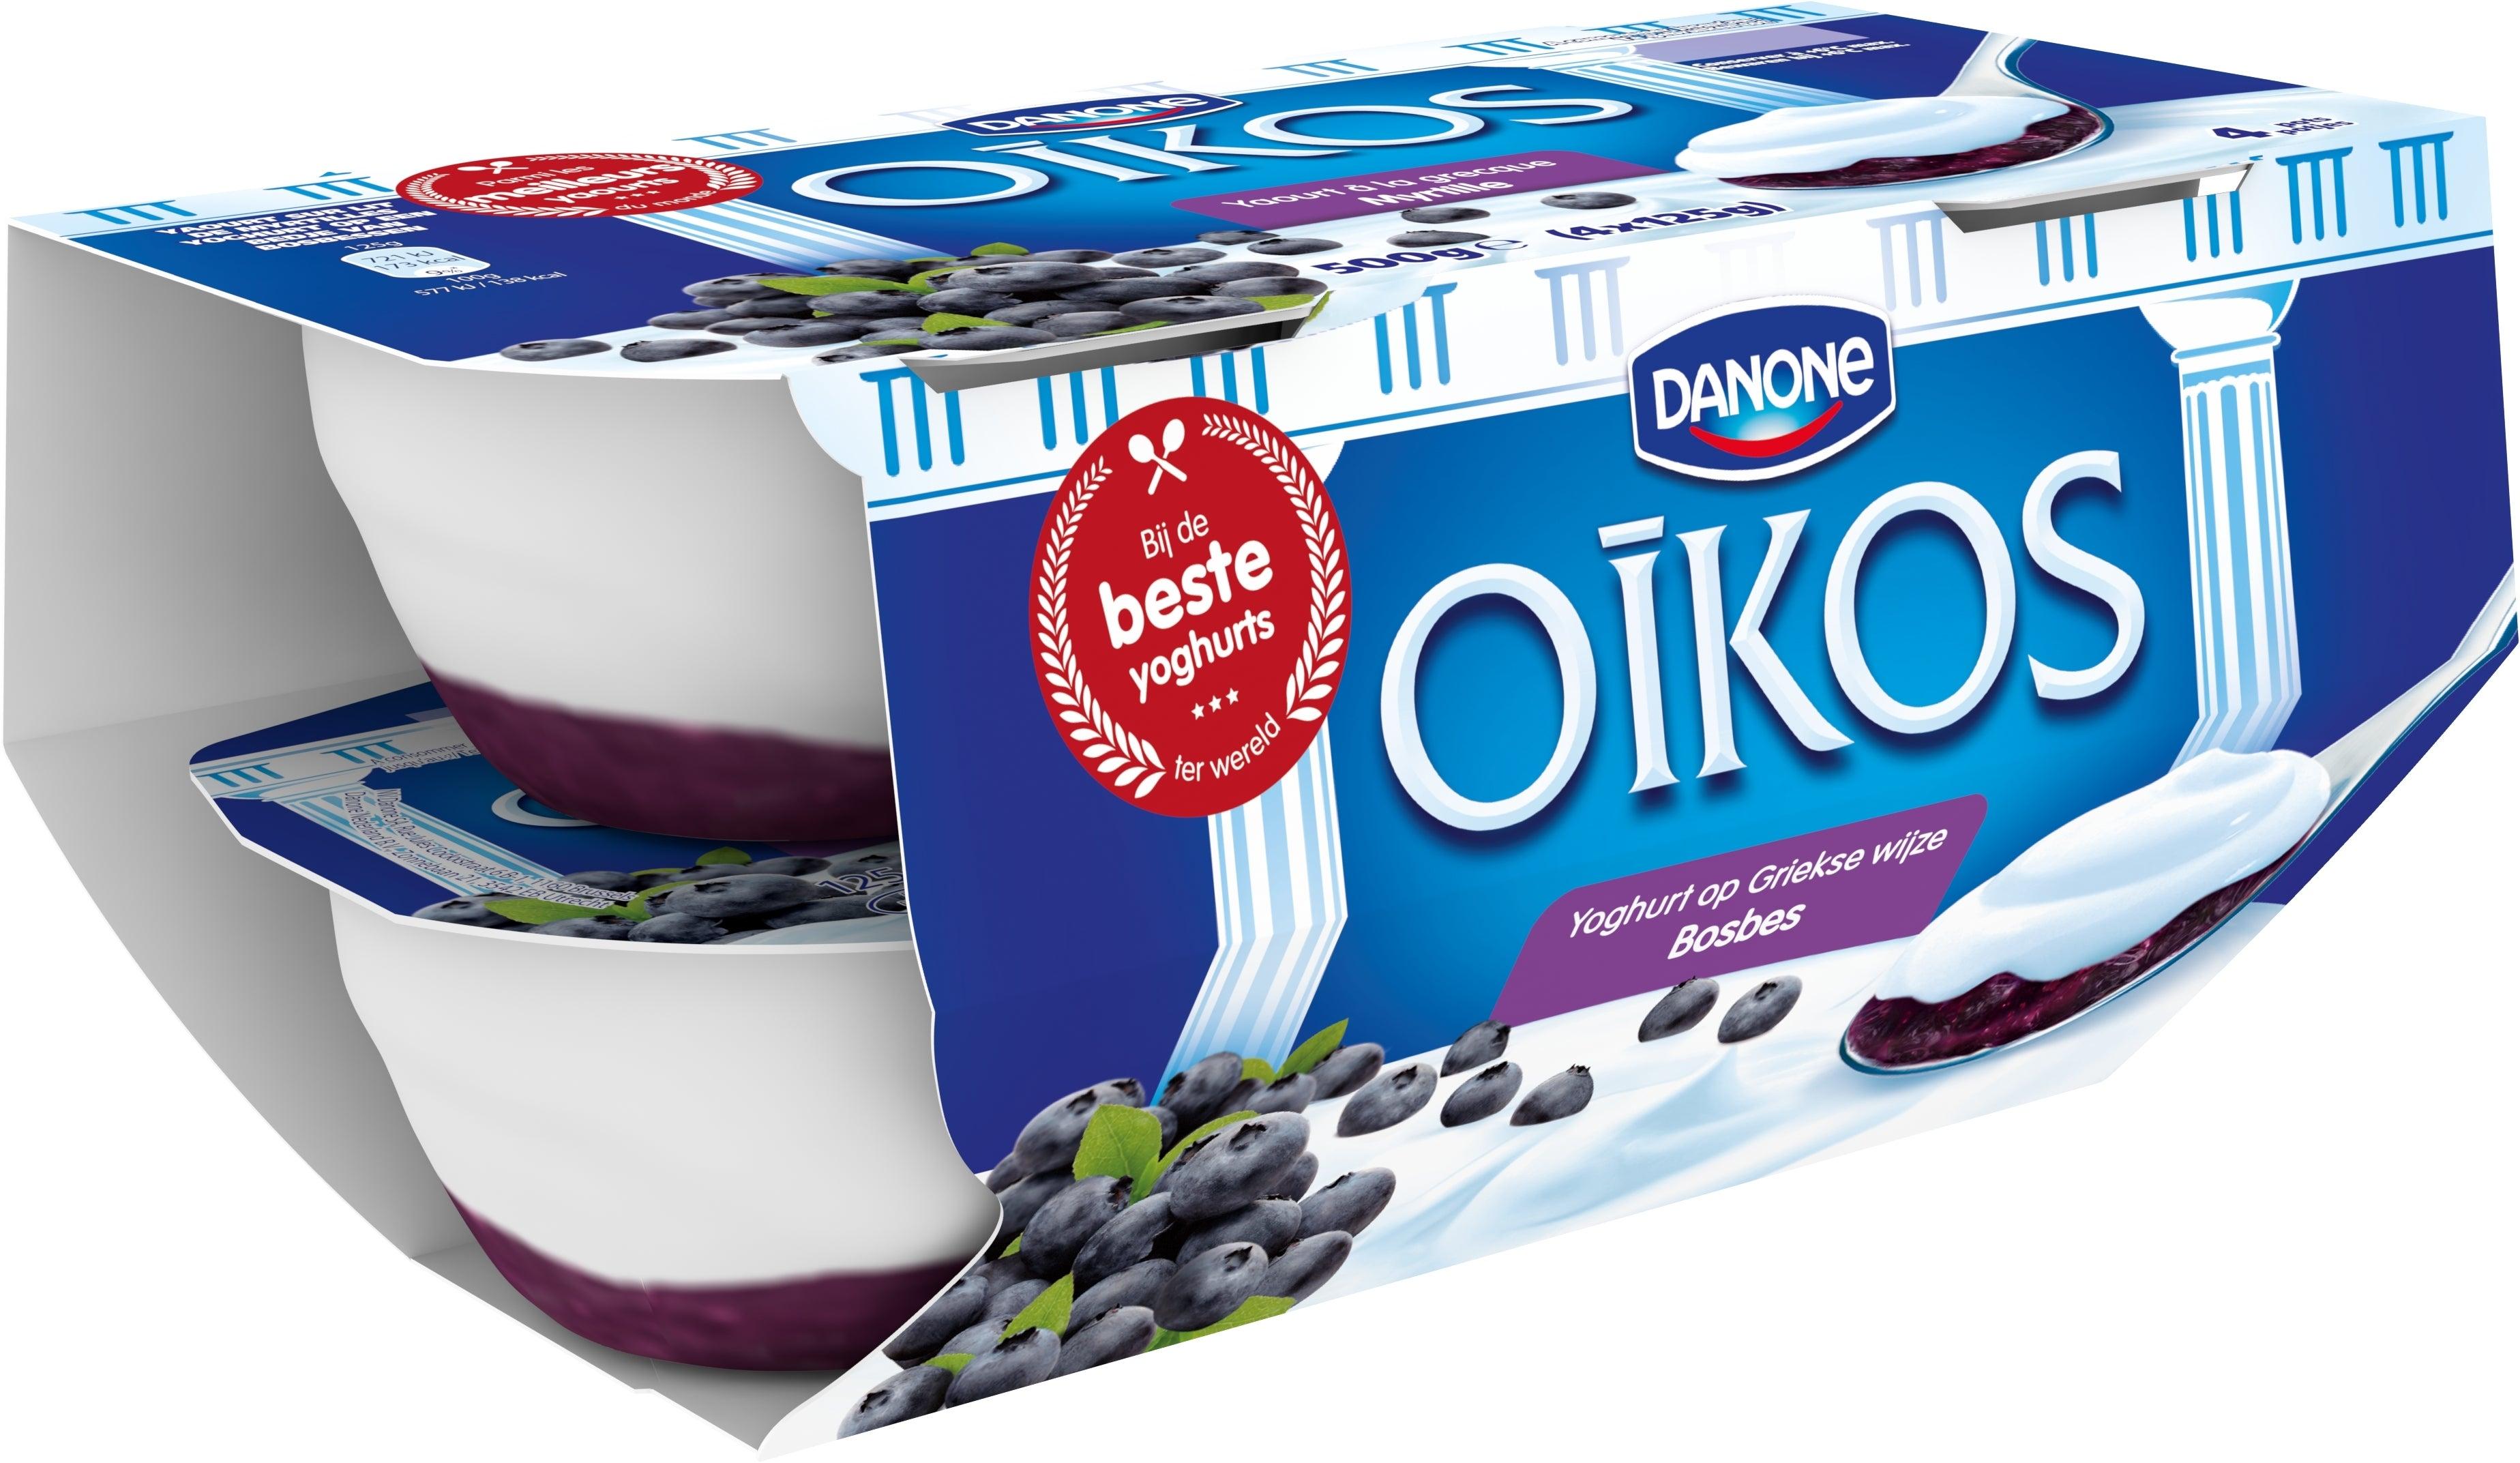 Oikos Yoghurt Vol Bosbes 4x125g